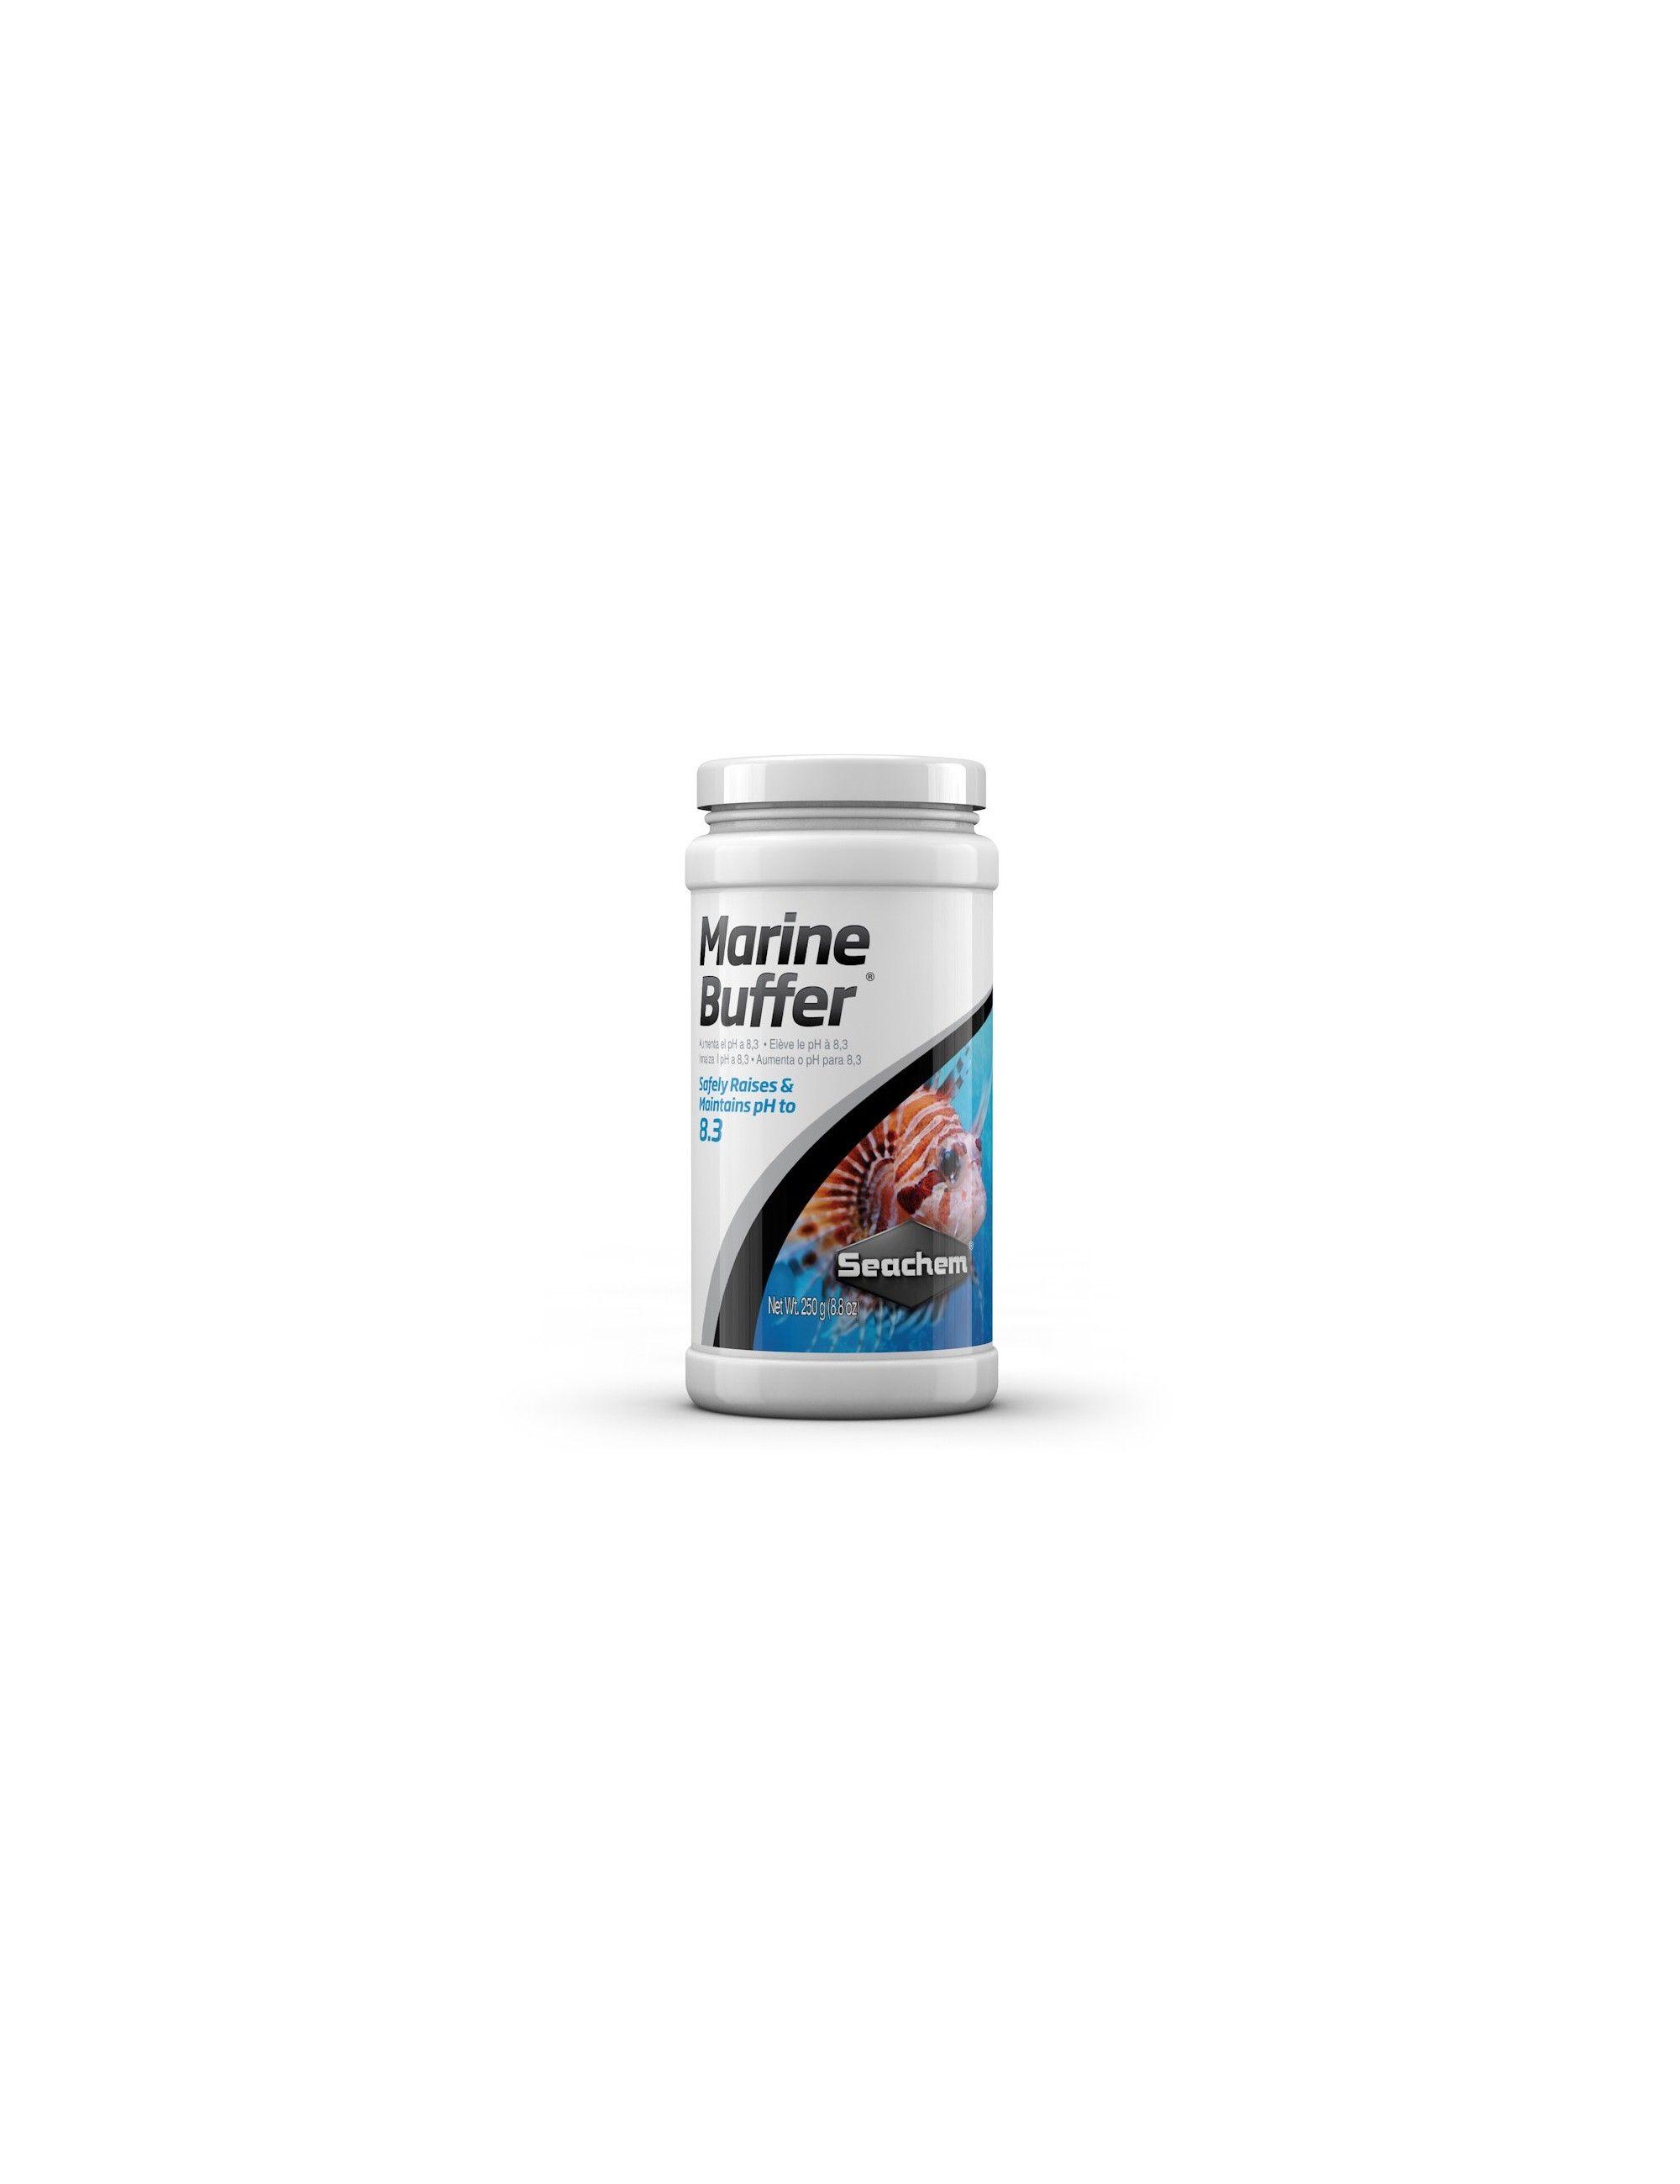 SEACHEM - Marine Buffer - 250 g - Élève le pH à 8,3